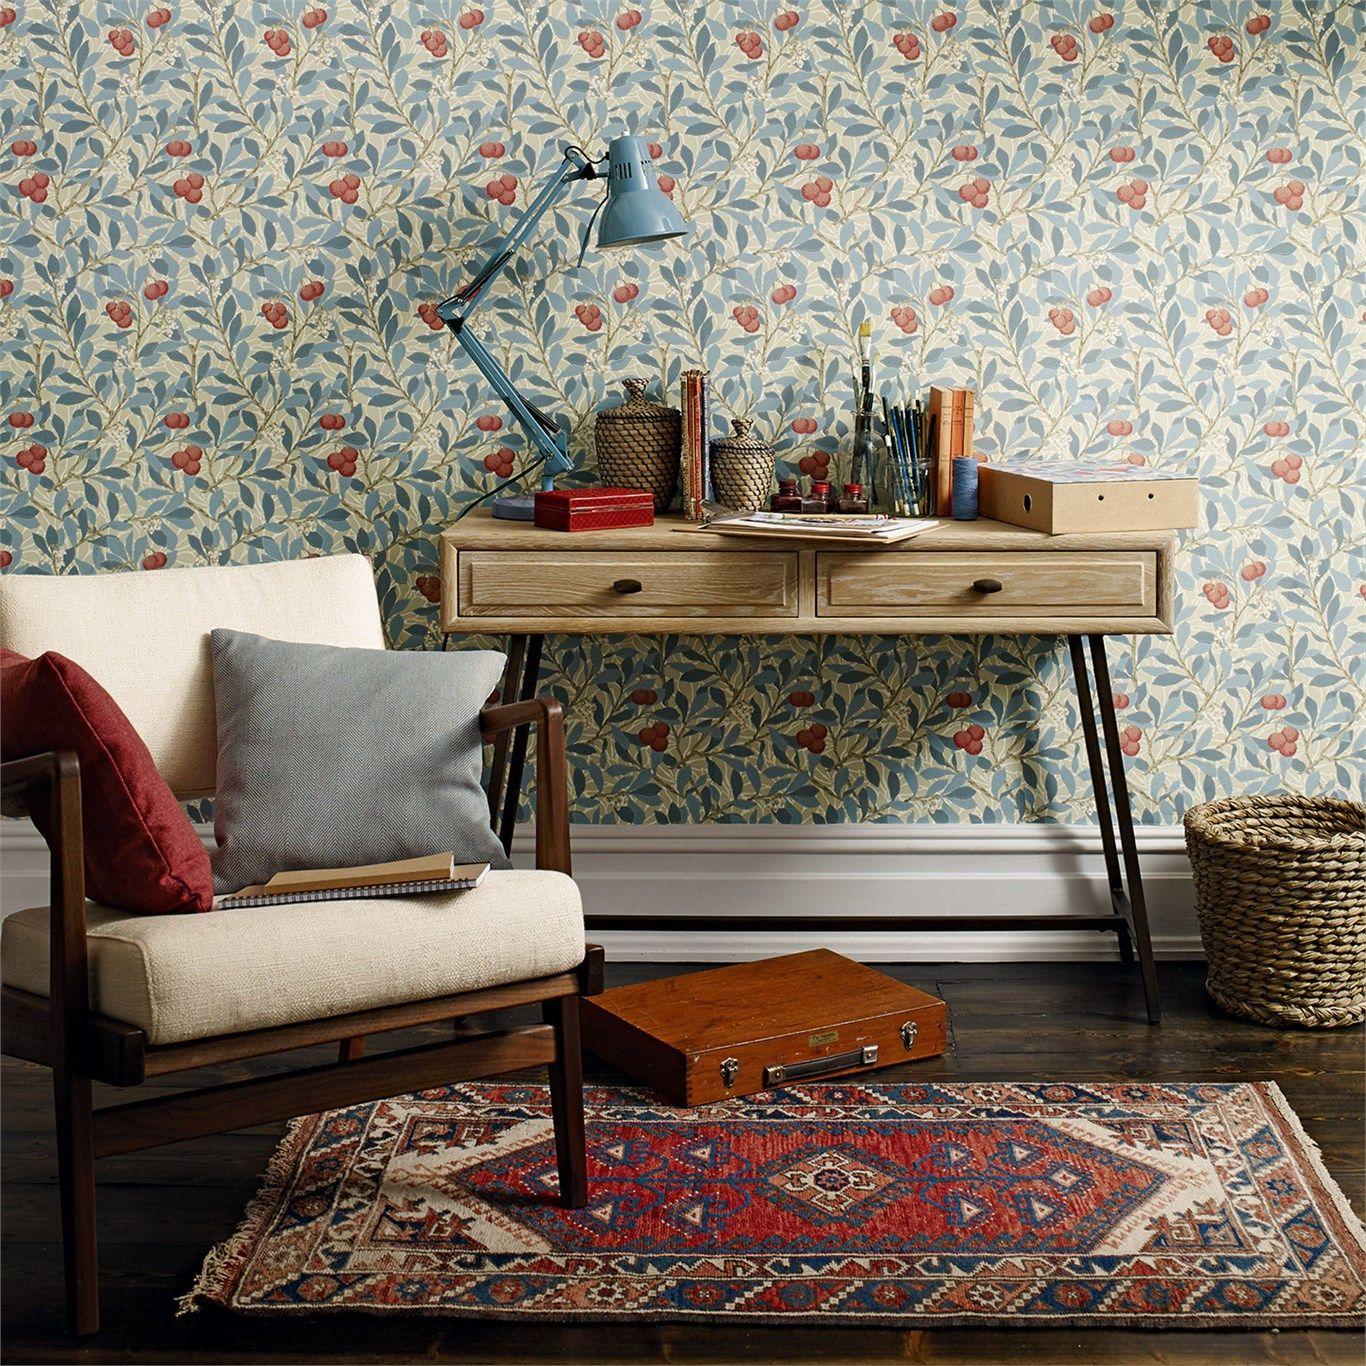 Design House Crafts Uk: Arts And Crafts, Fabrics And